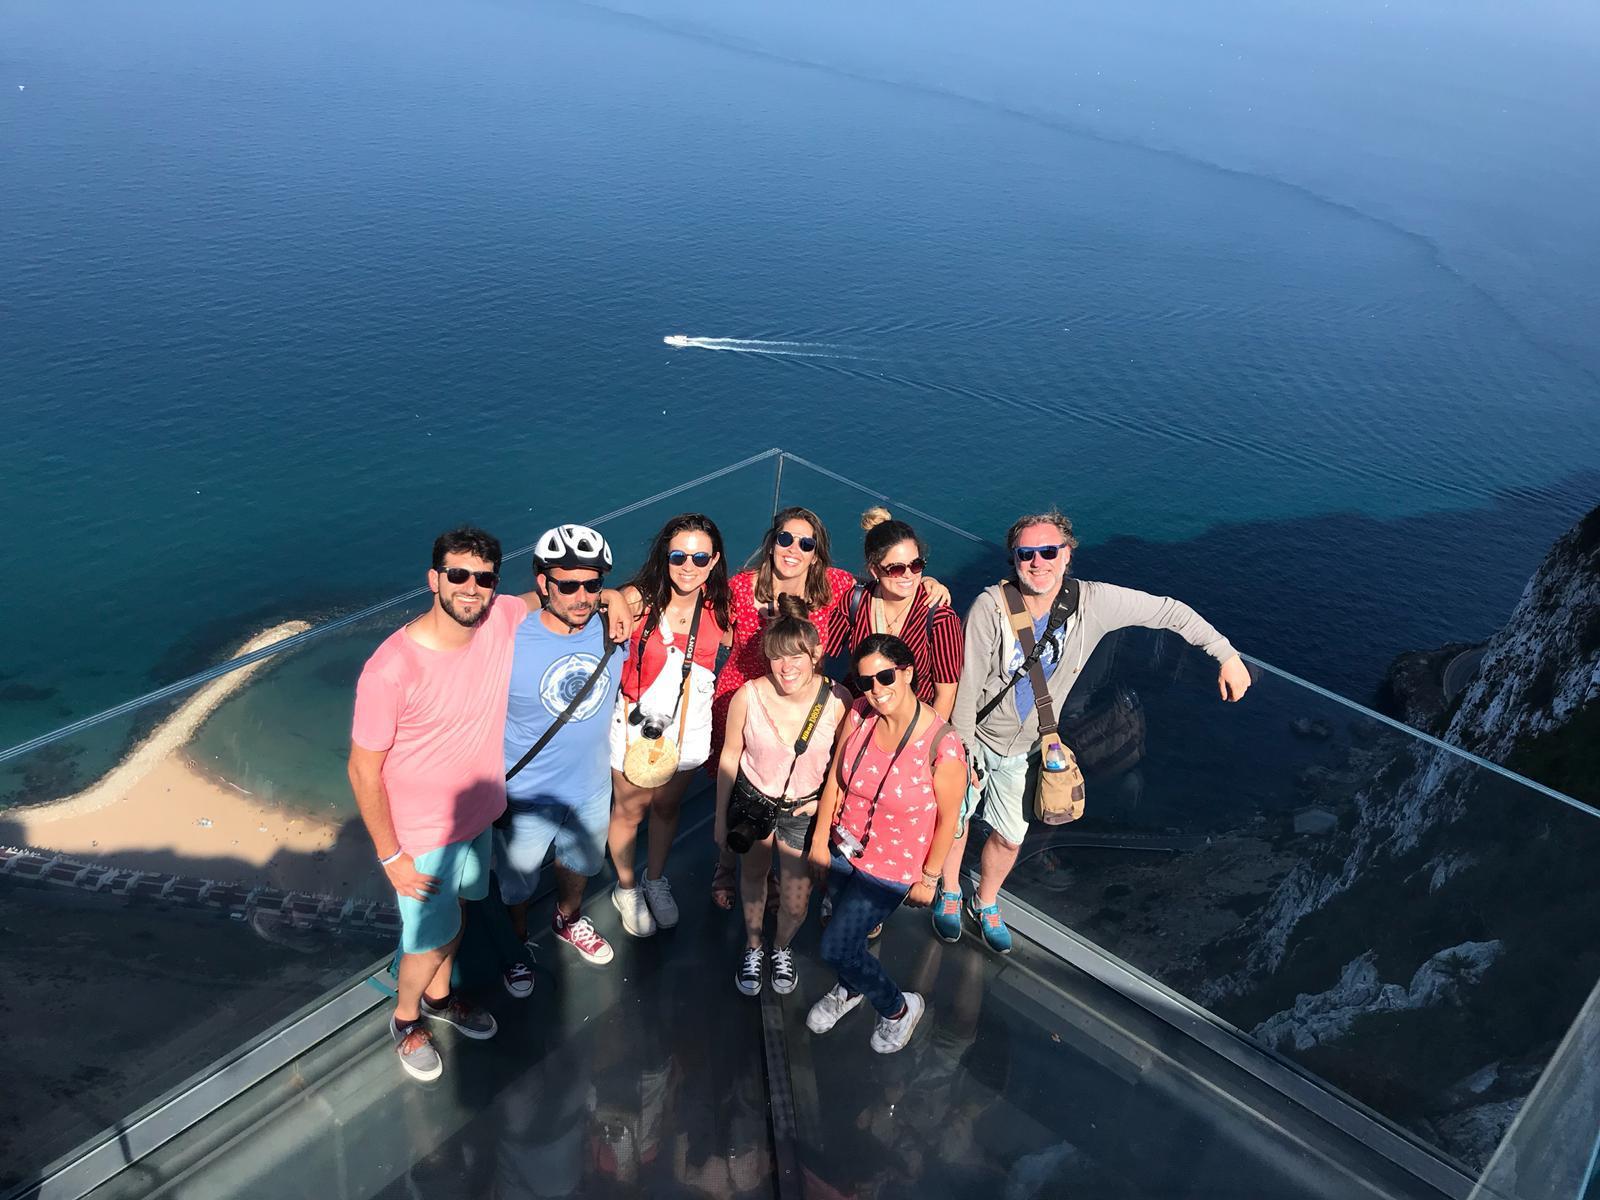 23-jun-2019-blogueros-espaoles-de-viajes-visitan-el-pen_48131093268_o